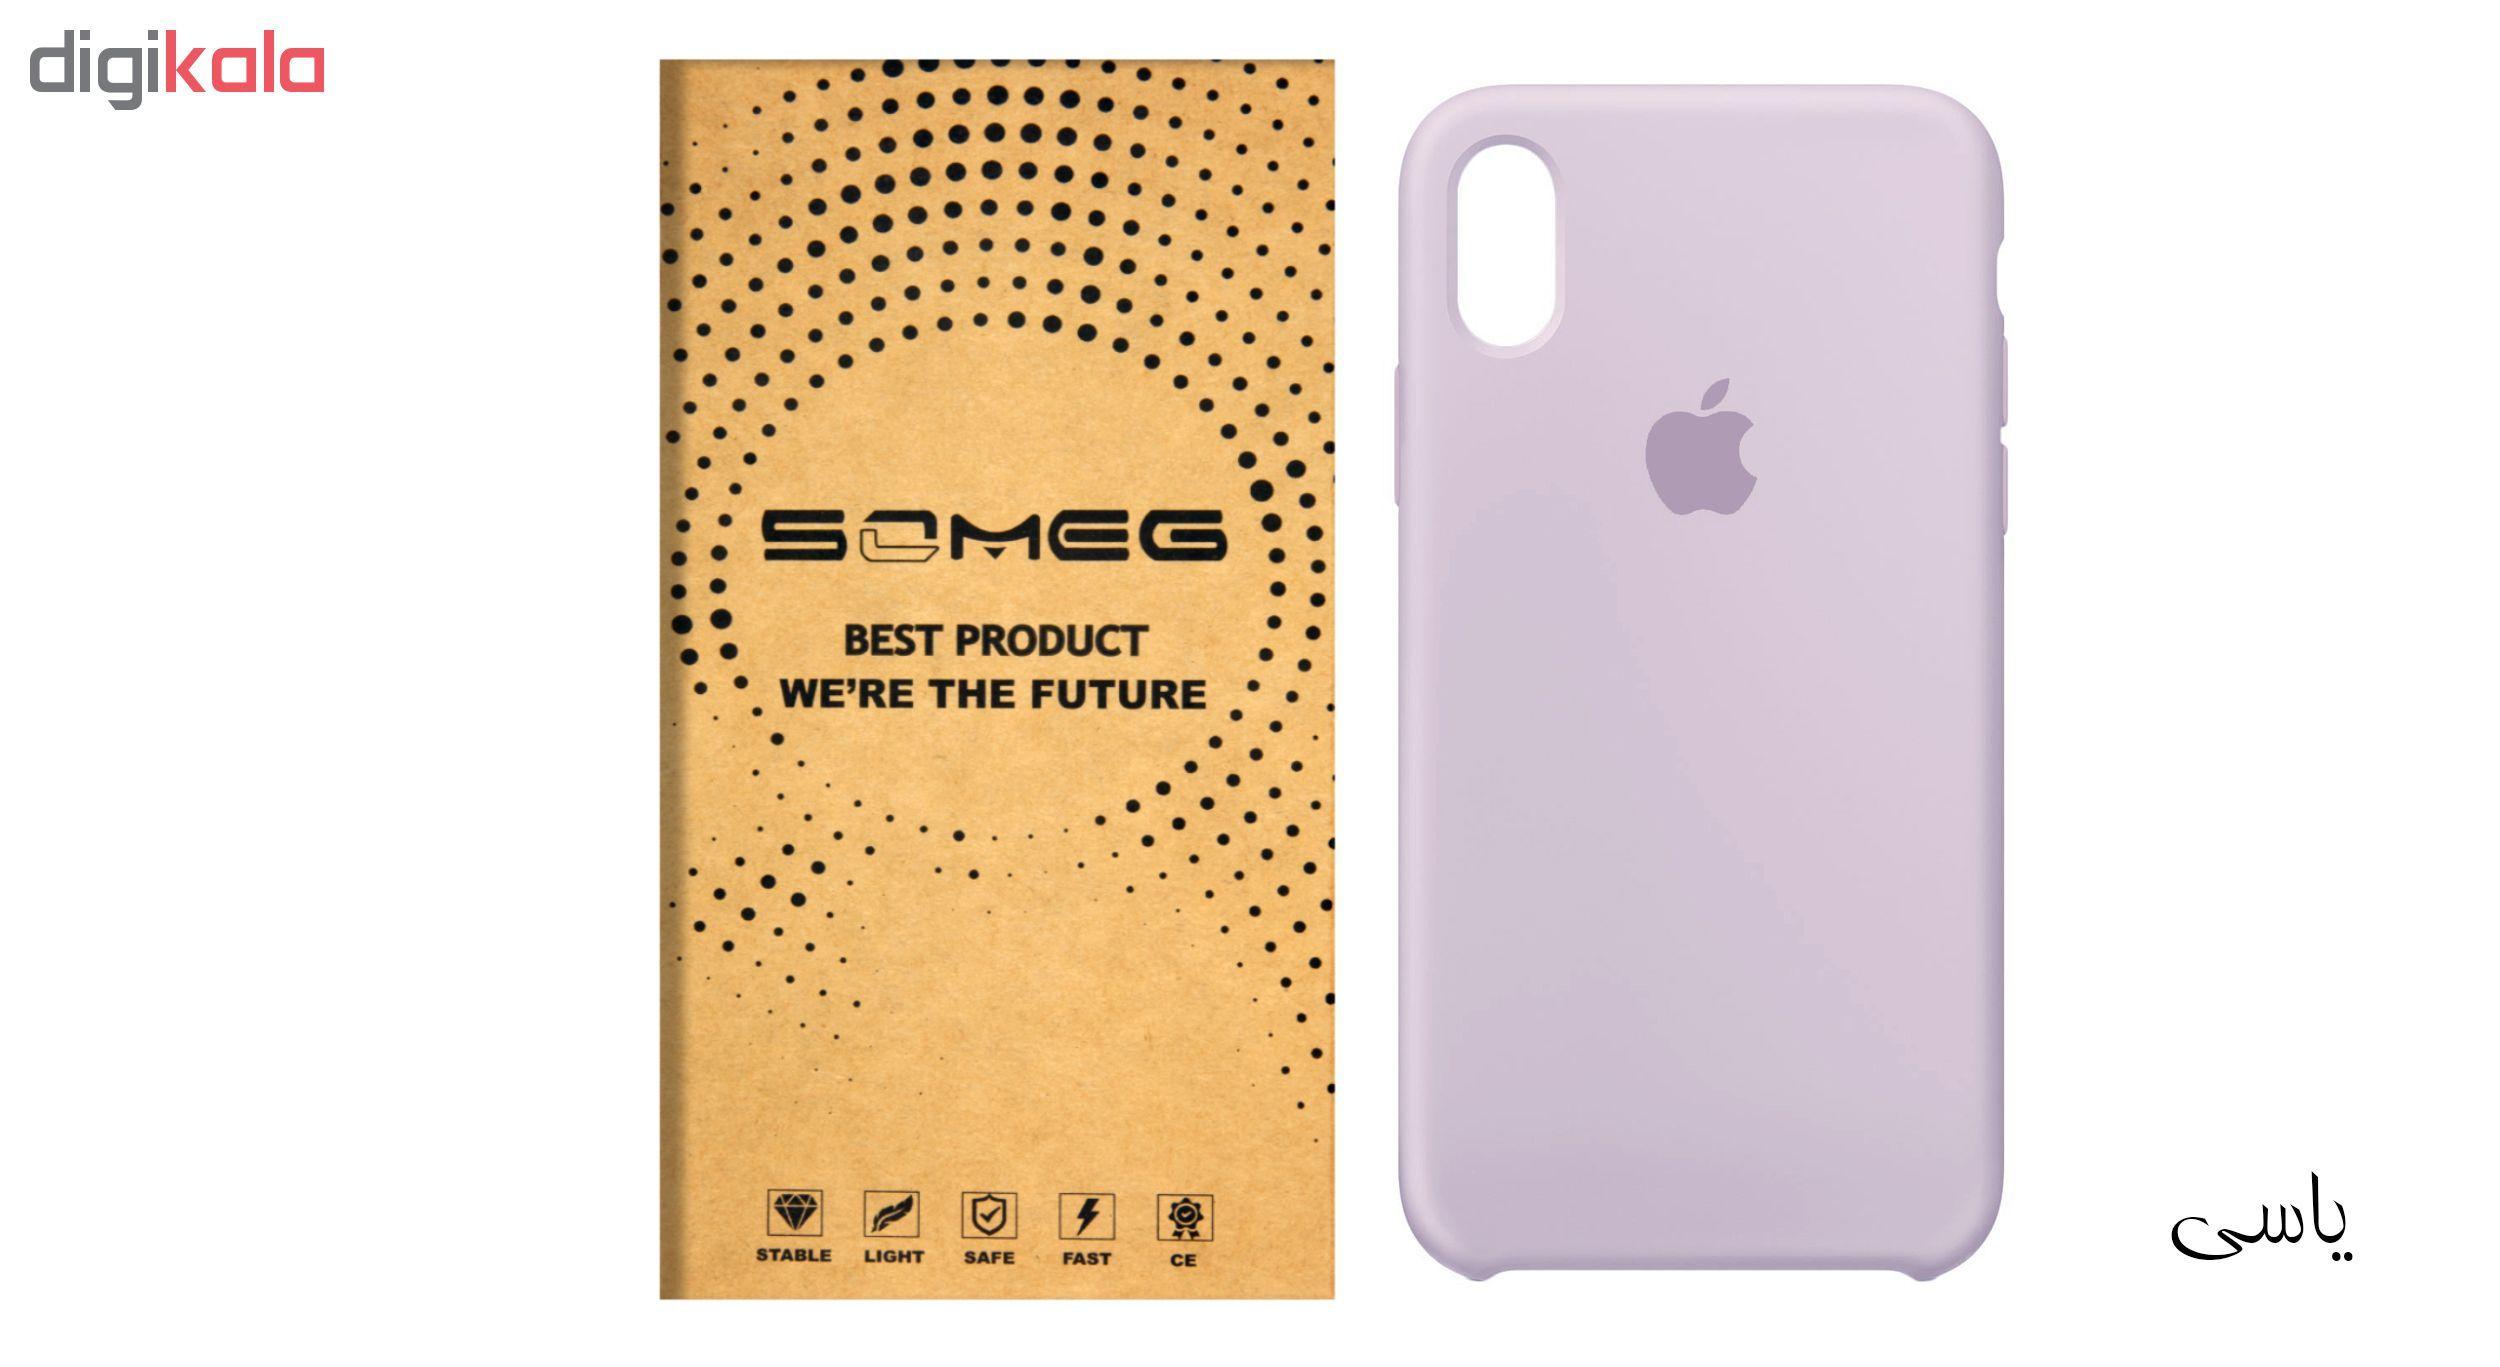 کاور سومگ مدل SIC مناسب برای گوشی موبایل اپل iPhone X  main 1 16